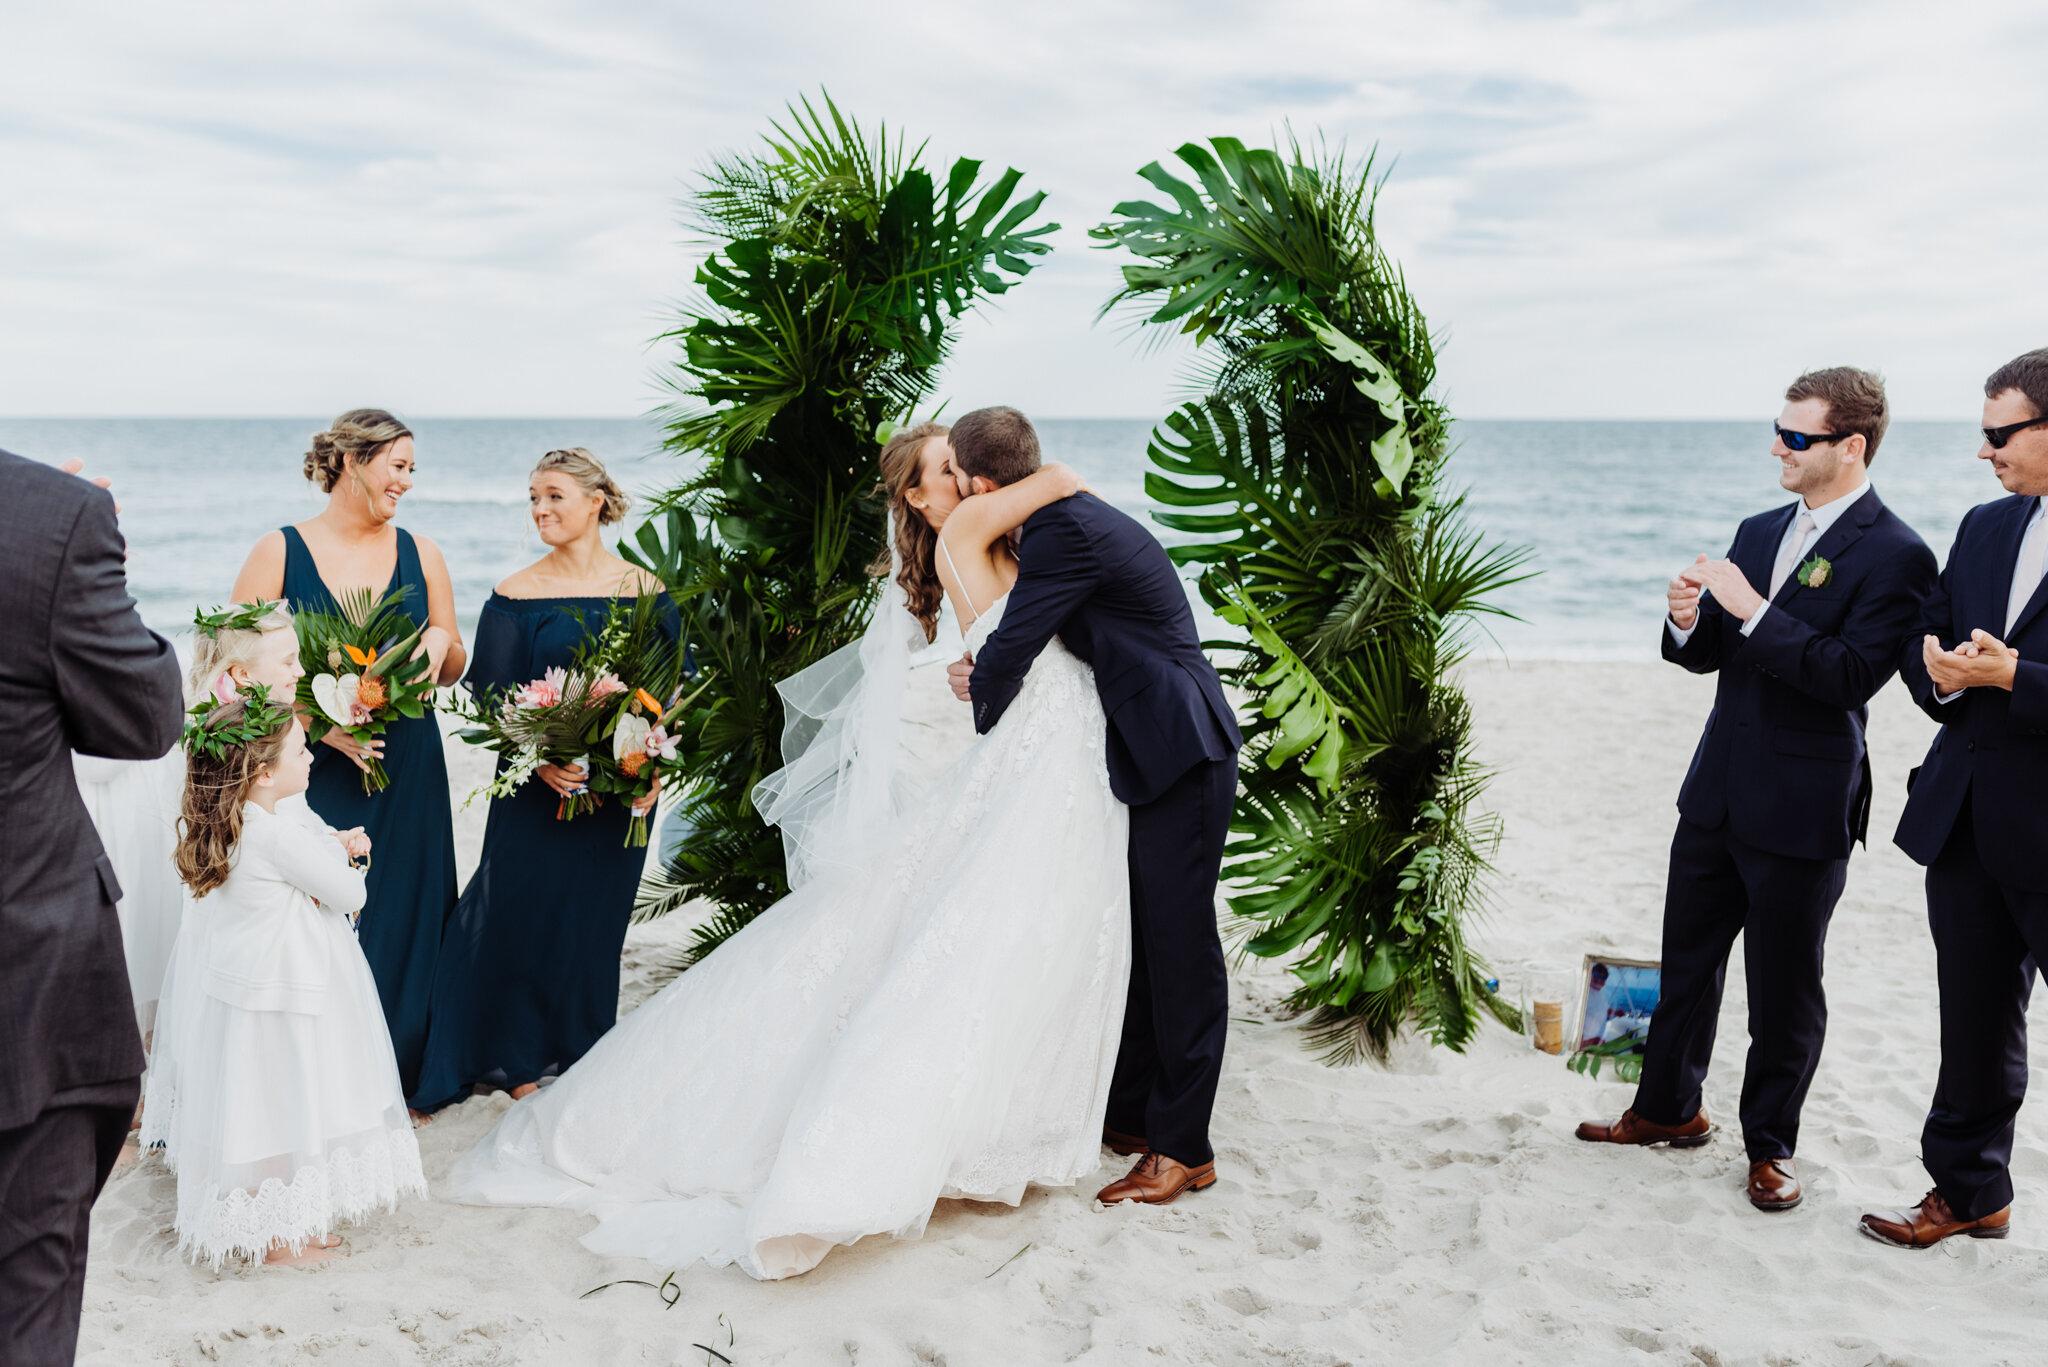 Beach+Wedding+Crim+Barefoot+Beach+Bride